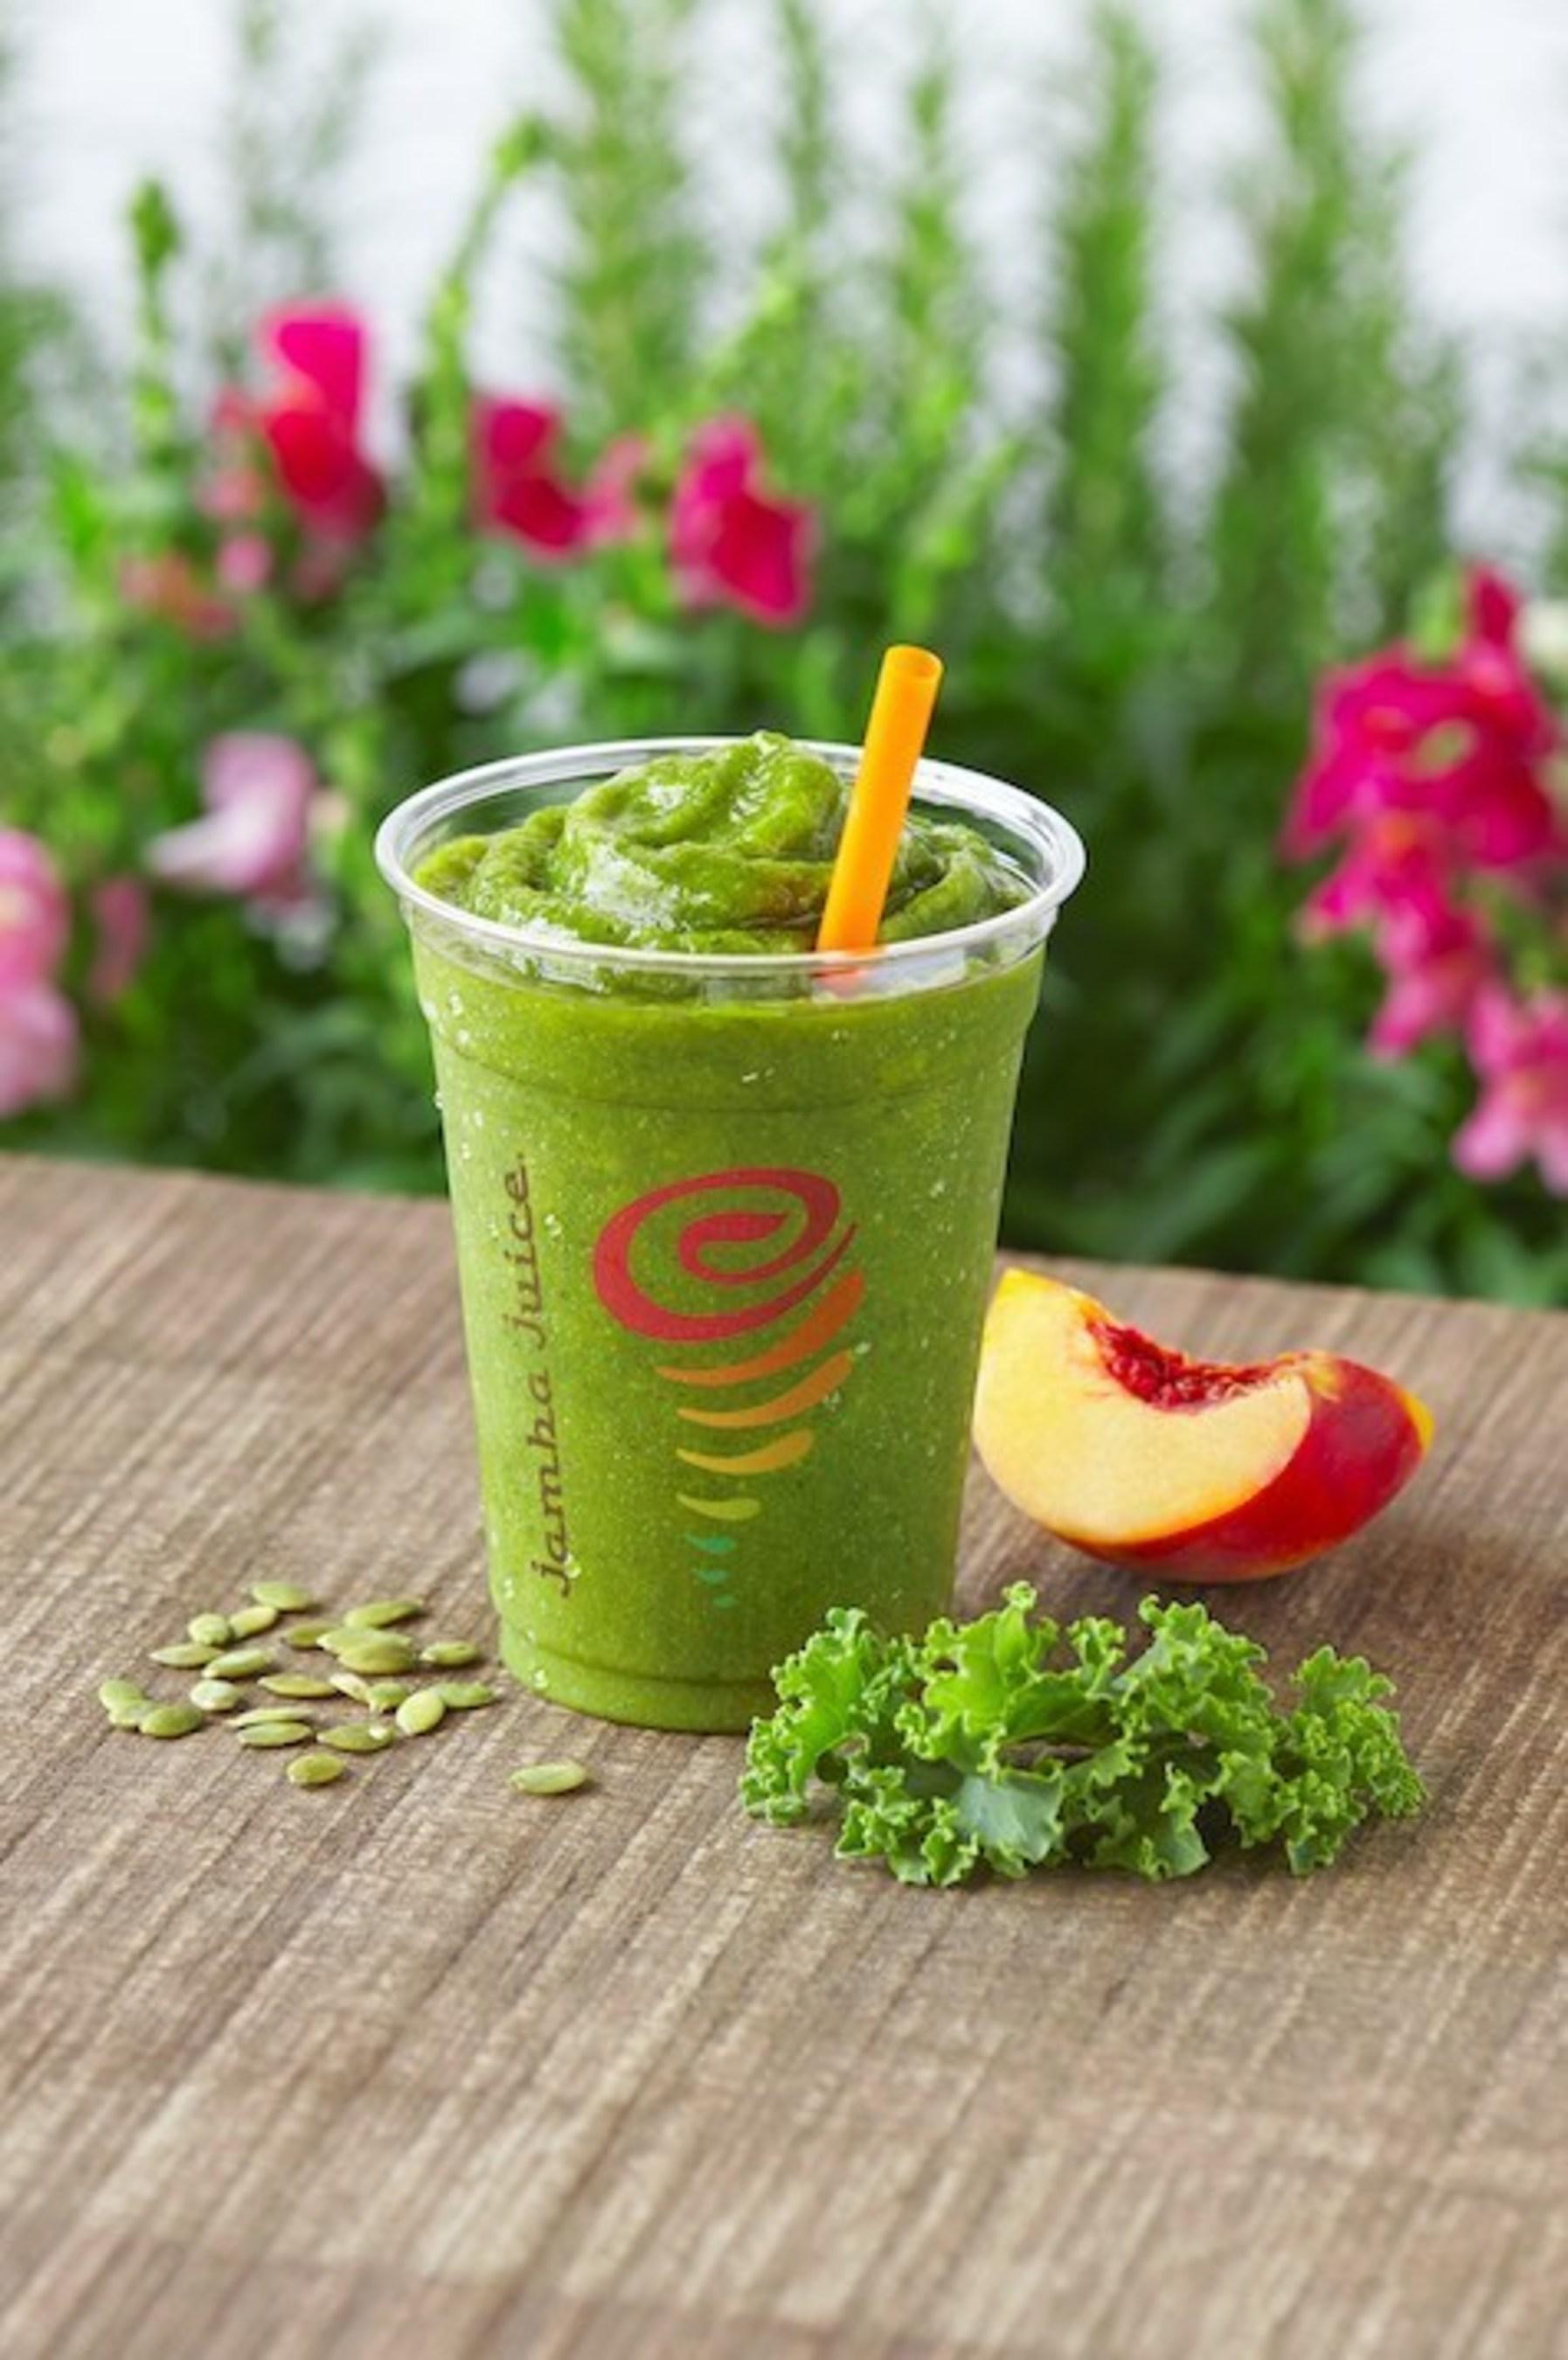 Jamba Juice Helps Consumers Enjoy a